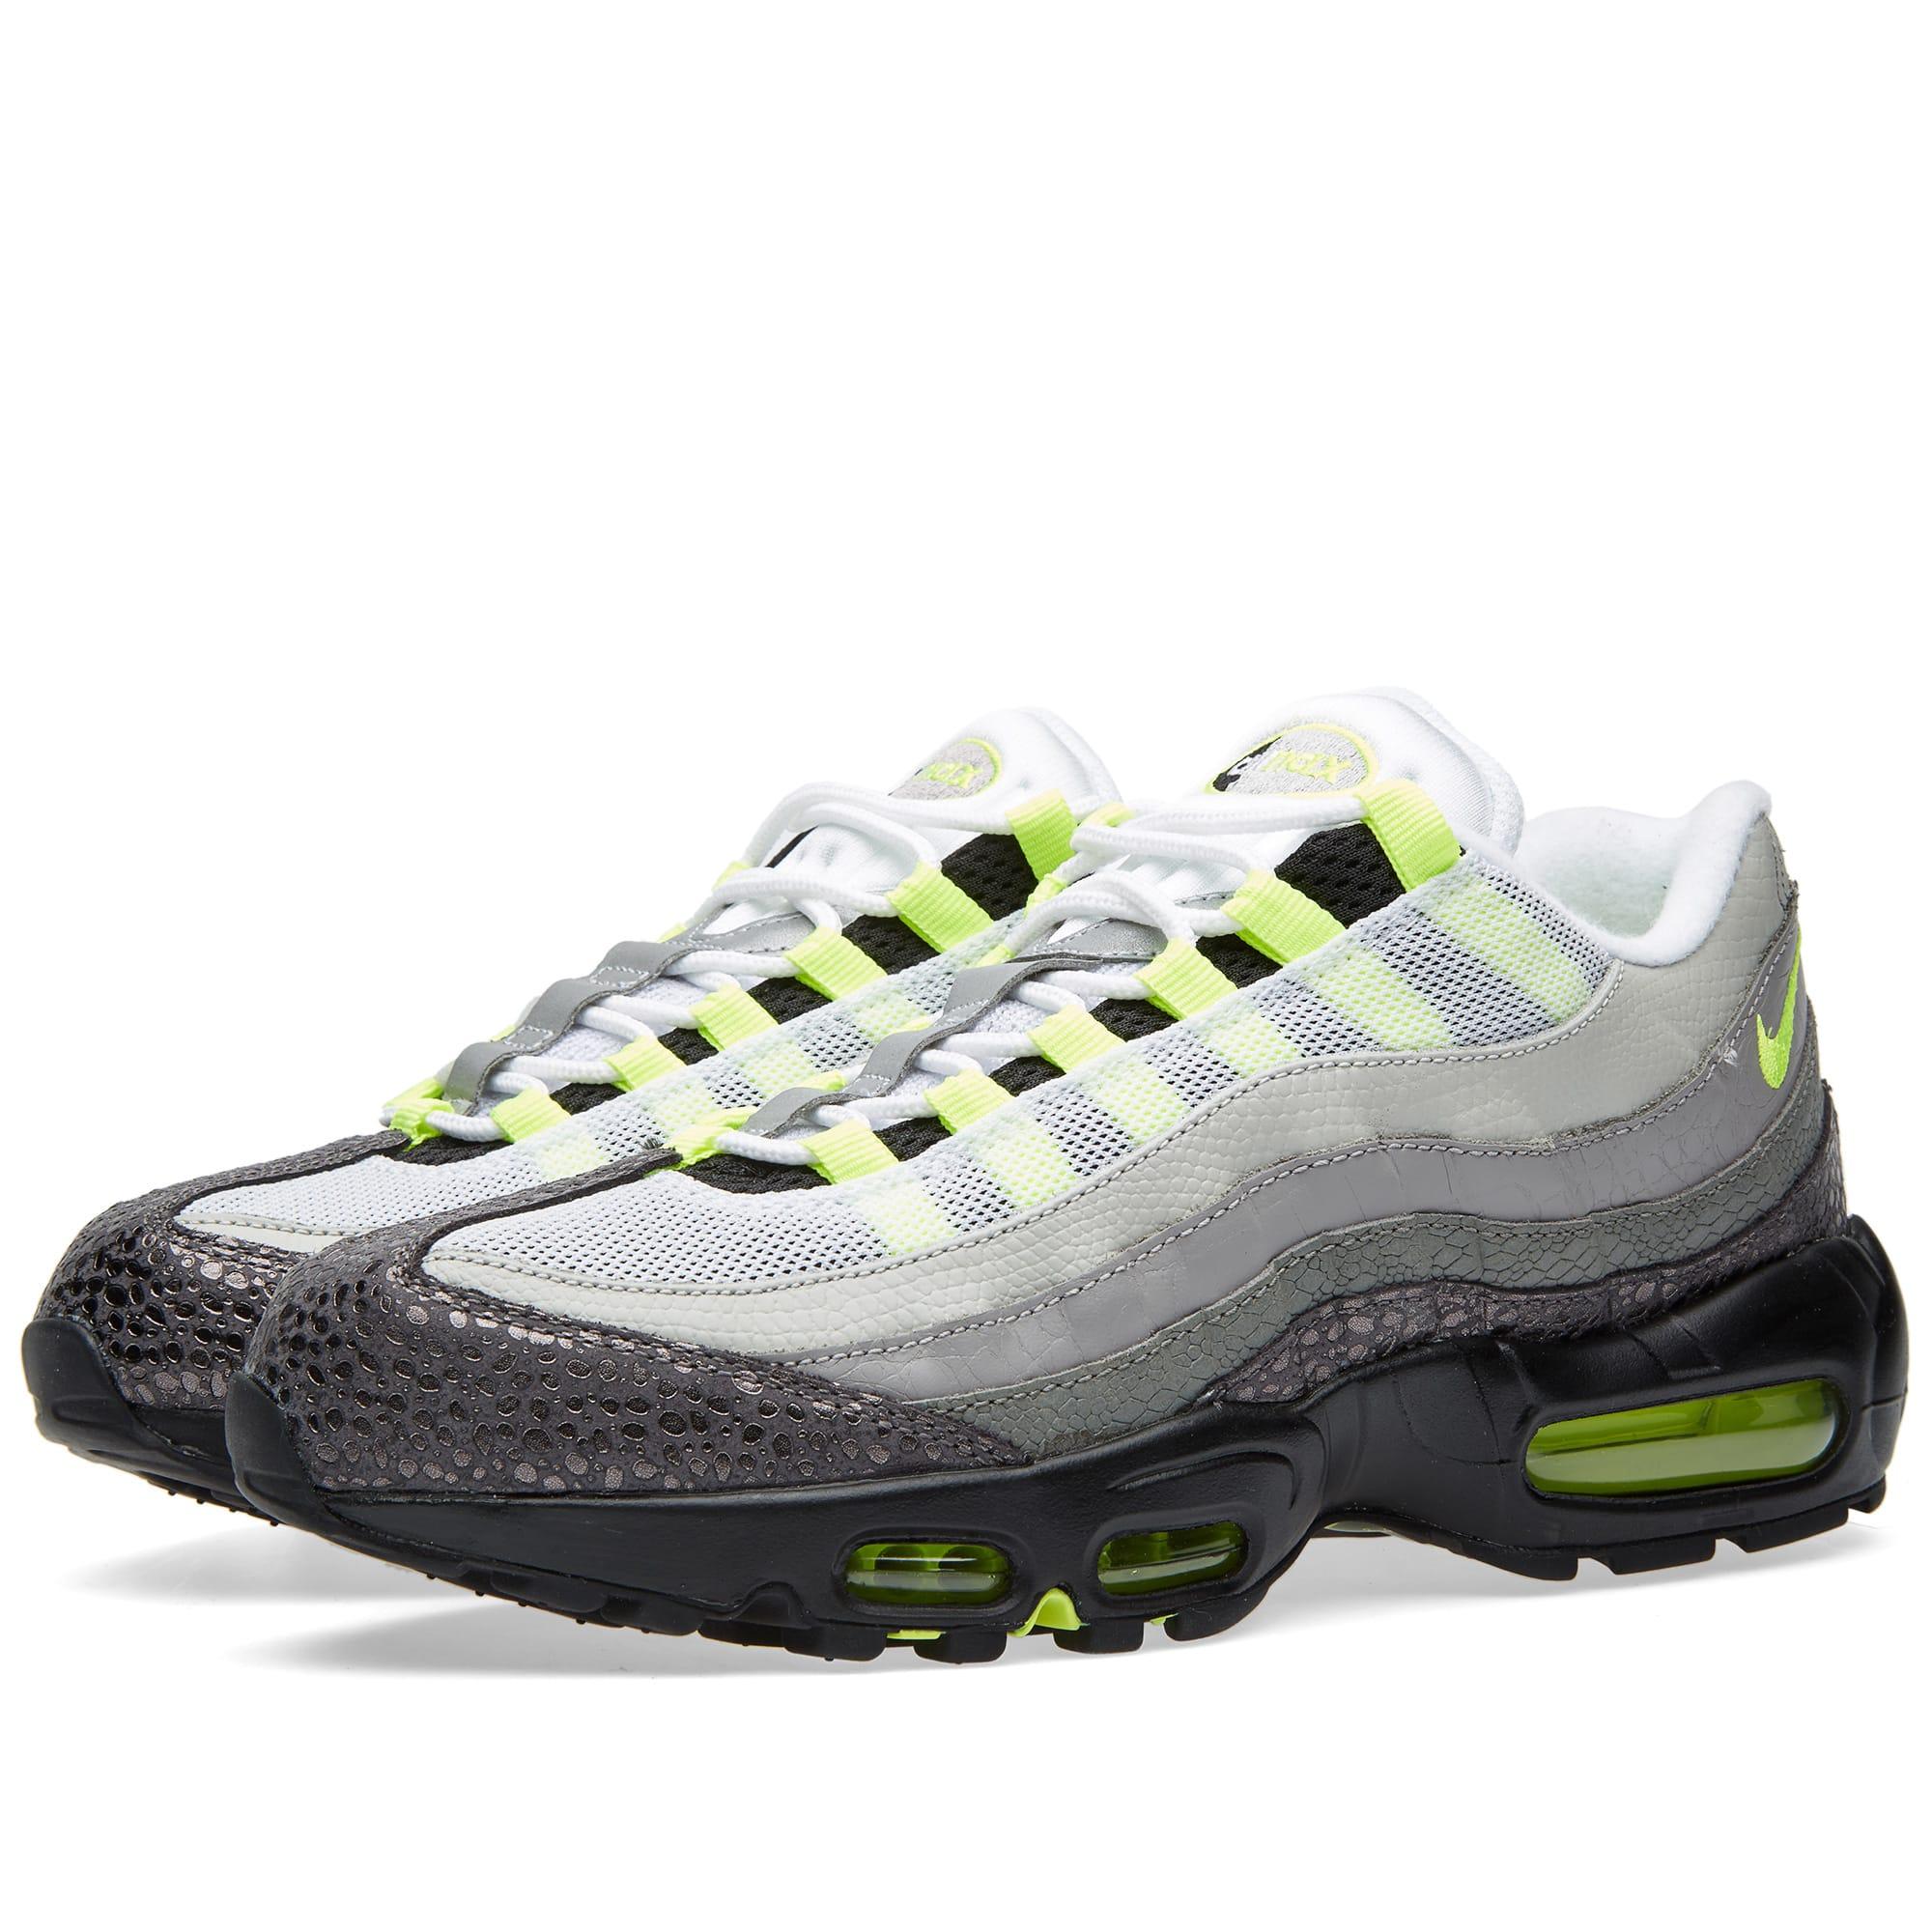 best sneakers 79256 e4dad Nike Air Max 95 OG Premium  Animal  Black, Volt   Medium Ash   END.